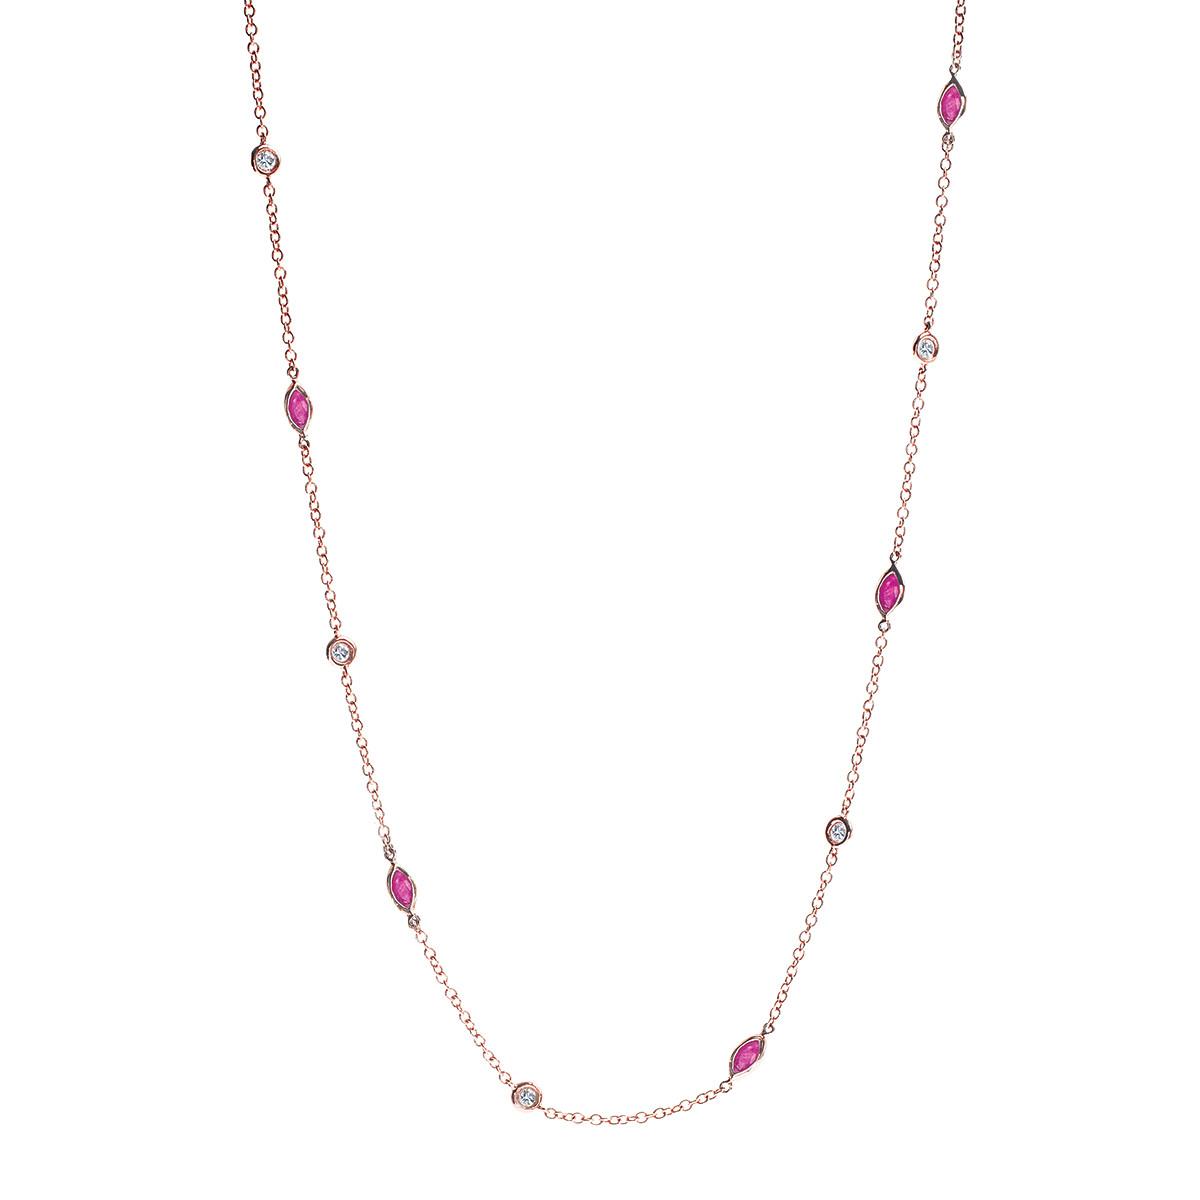 New 1.10 CTW Ruby & 0.90 CTW Diamond Necklace